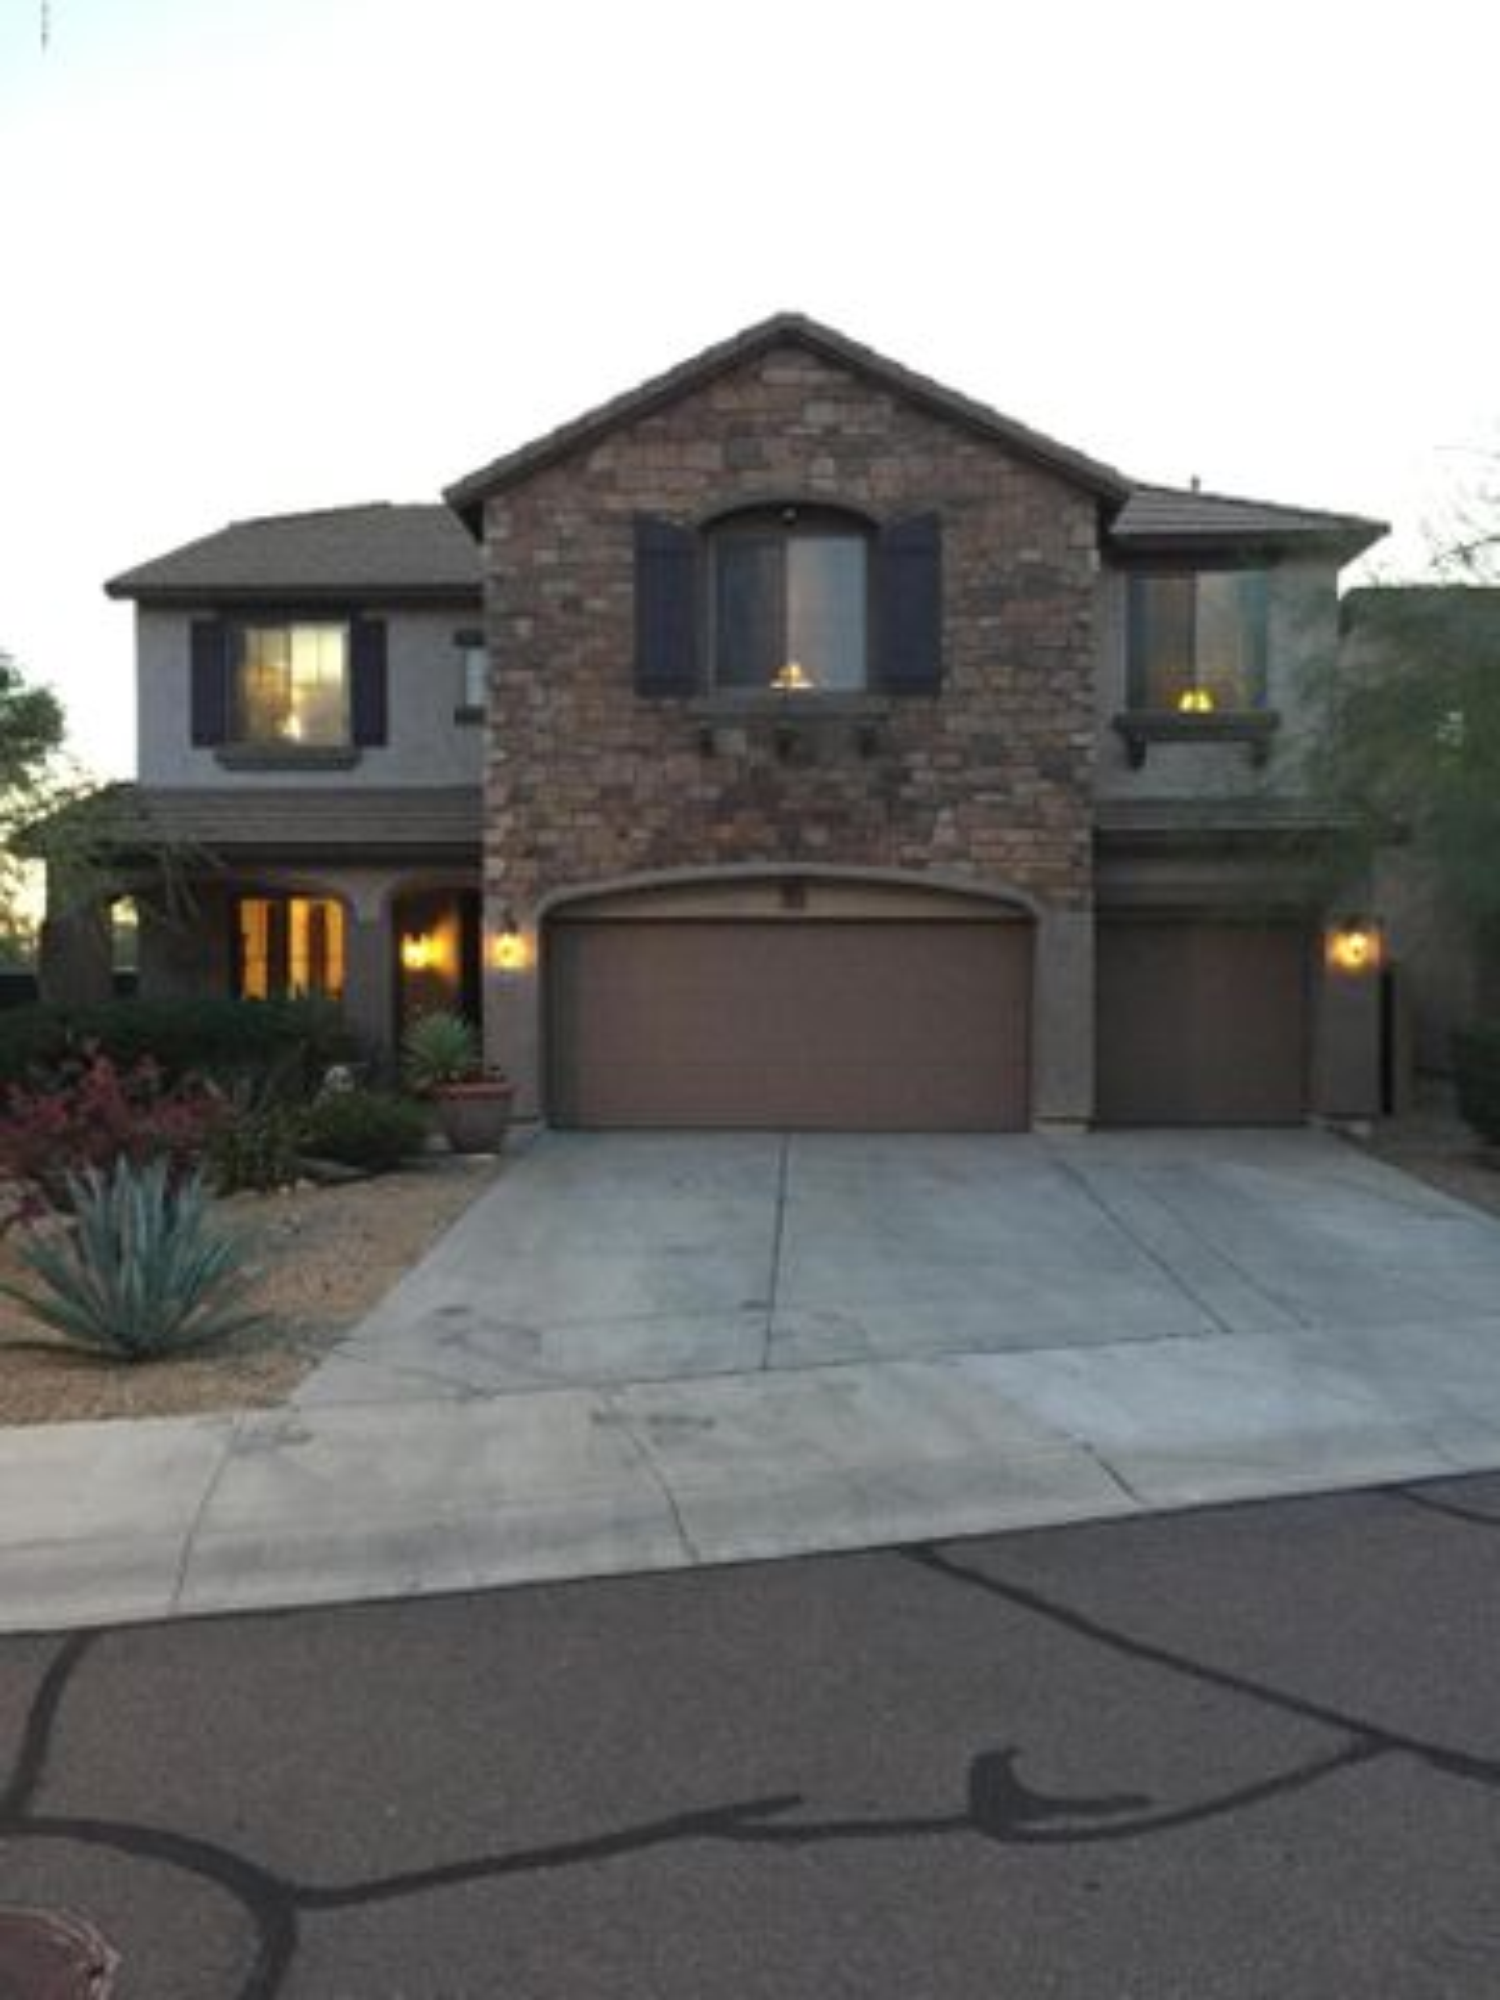 28002 N SIERRA SKY Drive, Peoria, AZ 85383